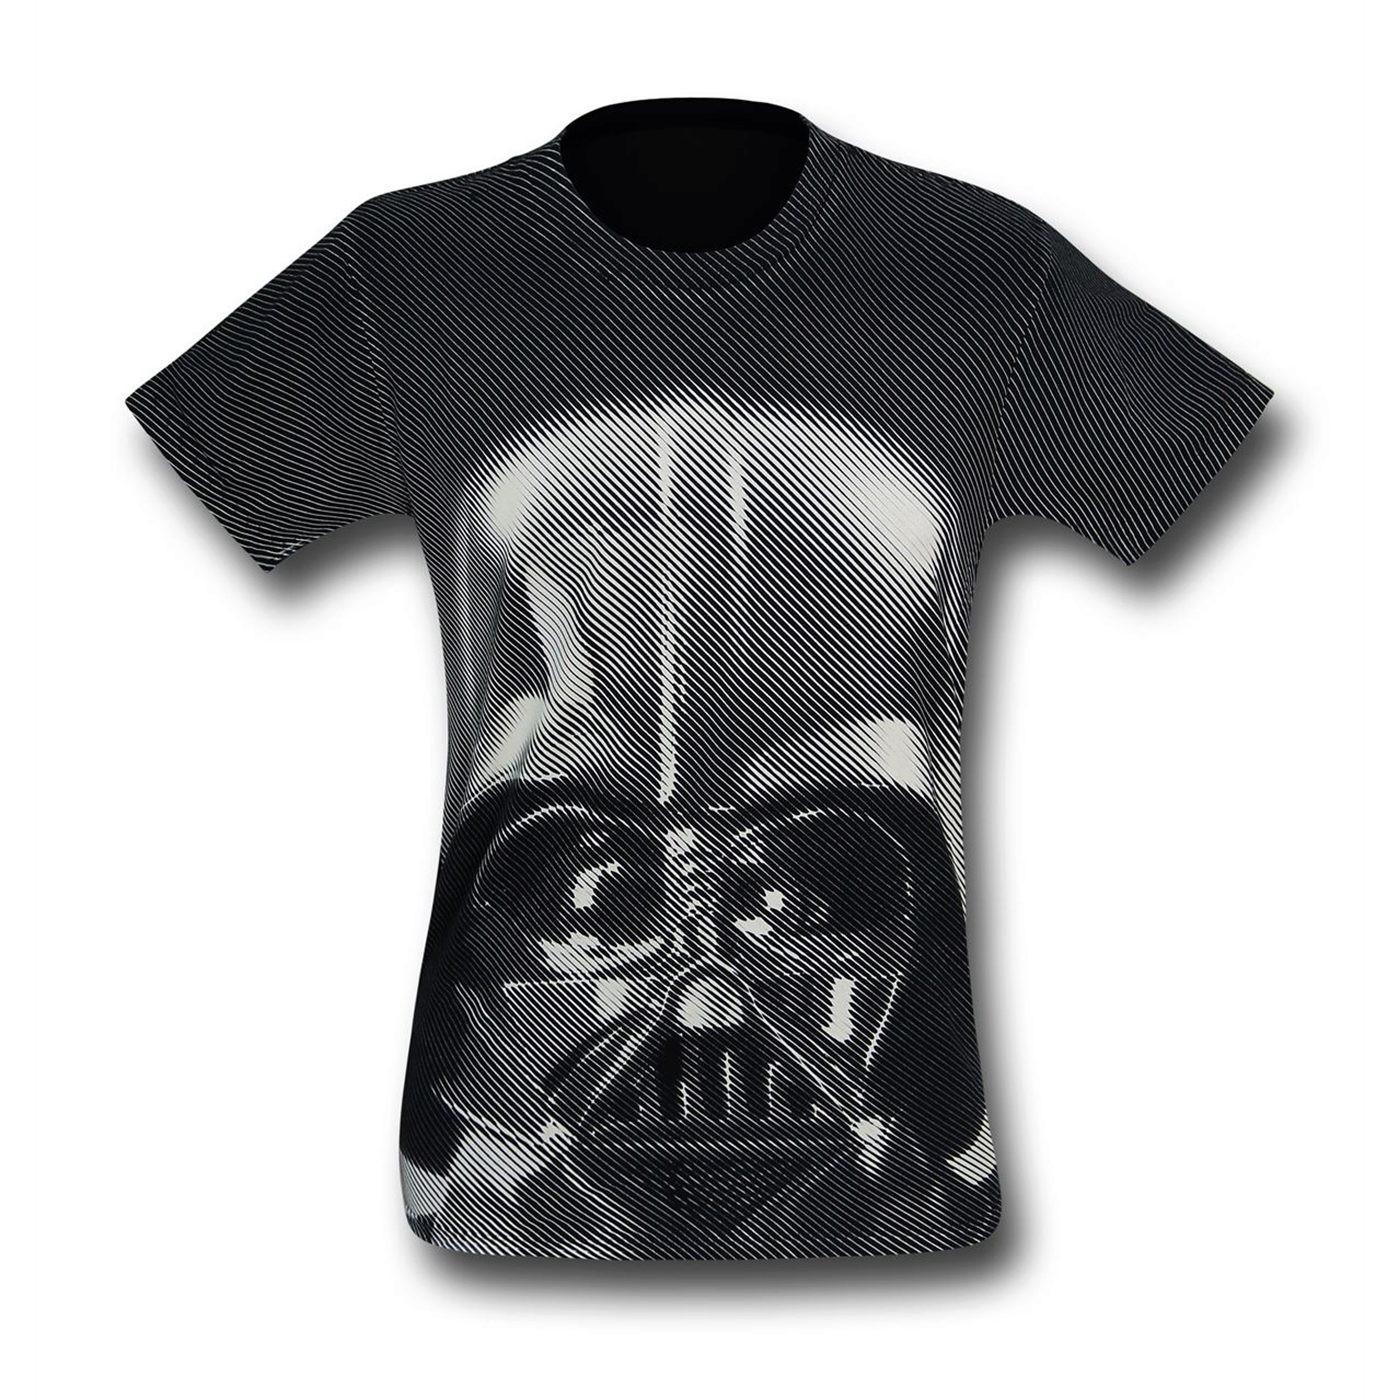 Star Wars Darth Vader All-Over Print Men's T-Shirt